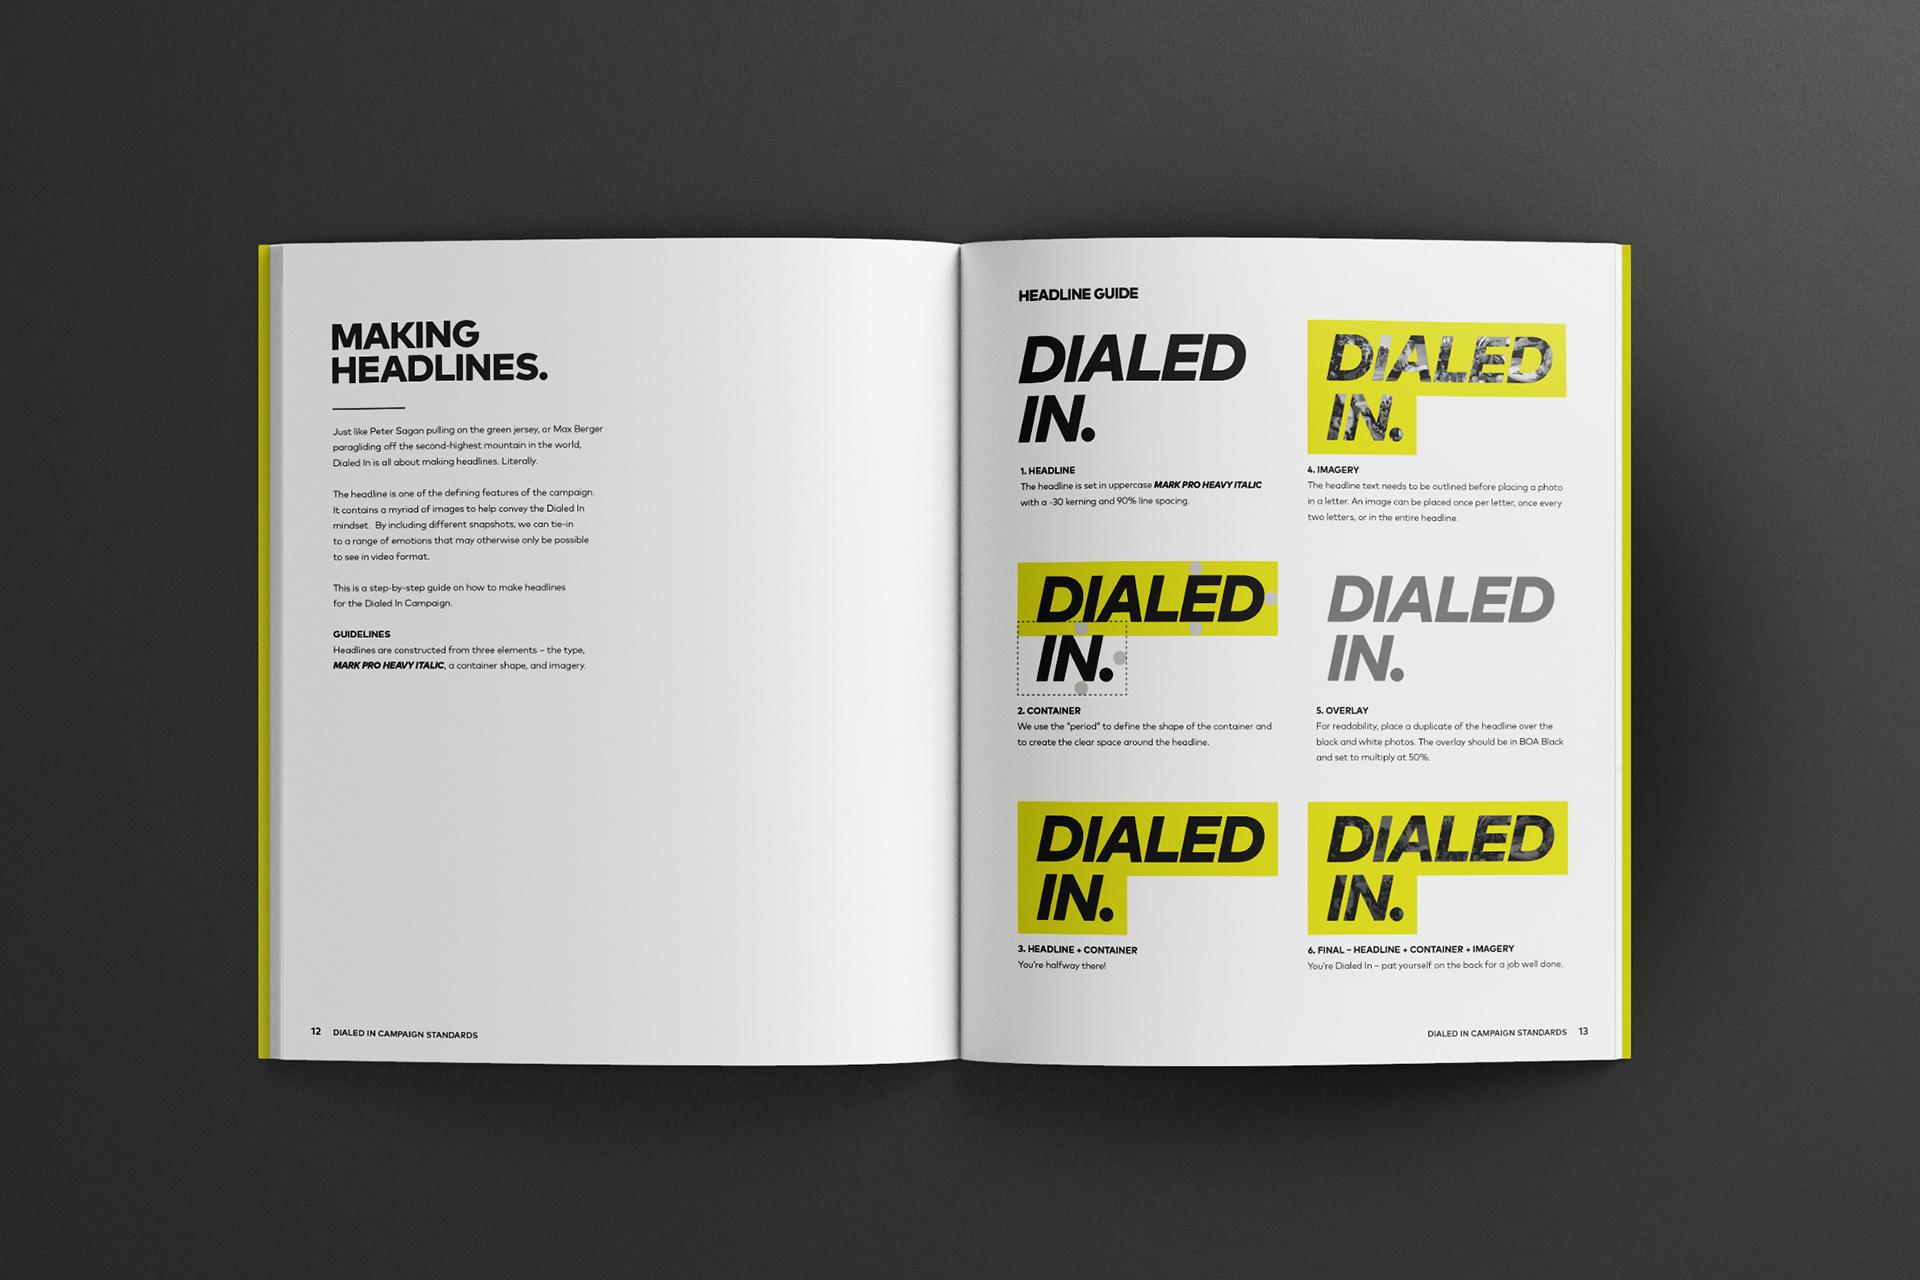 MikeSpencerDesign-DialedInCampaign-StandardsHeadlines-1920×1280-1